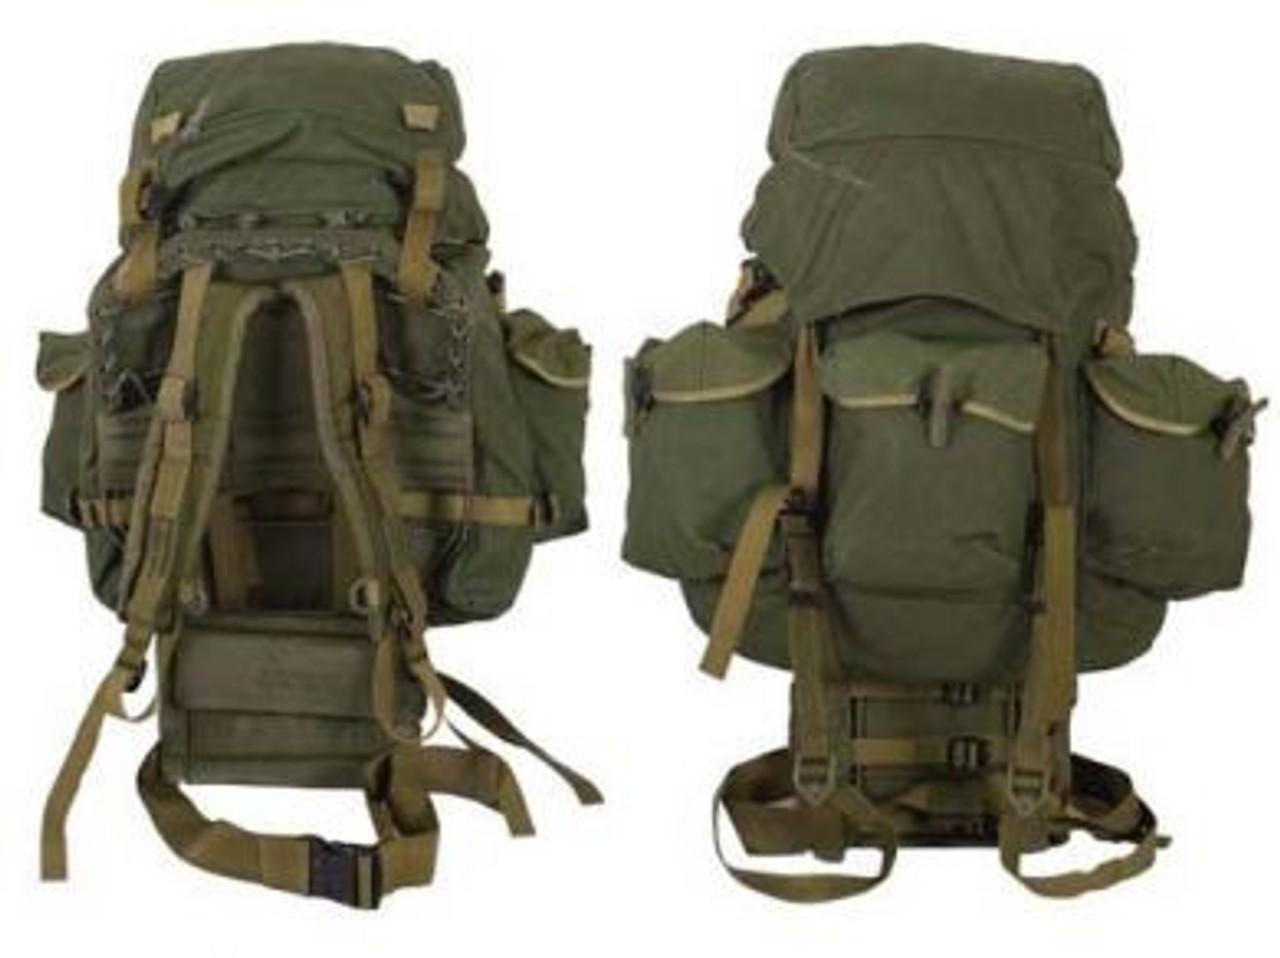 5 x CF82 Packs, Bag Only (Frame, Straps, & Belt Not Included).